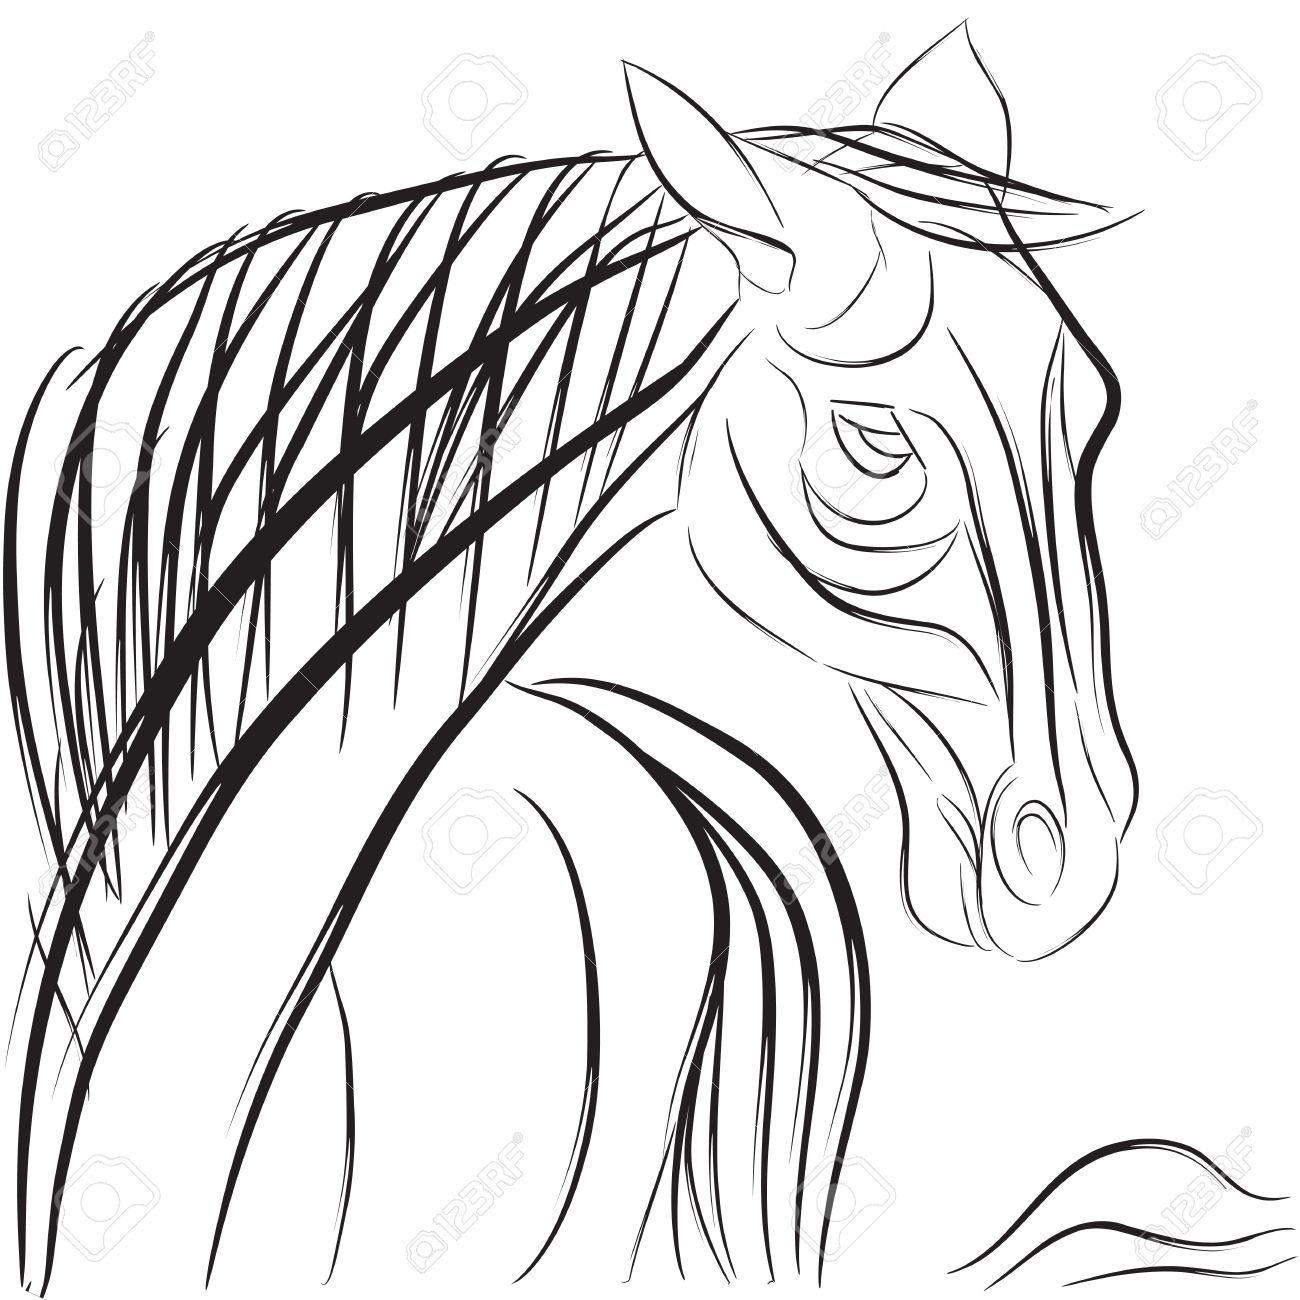 1300x1300 Drawn Profile Horse Head